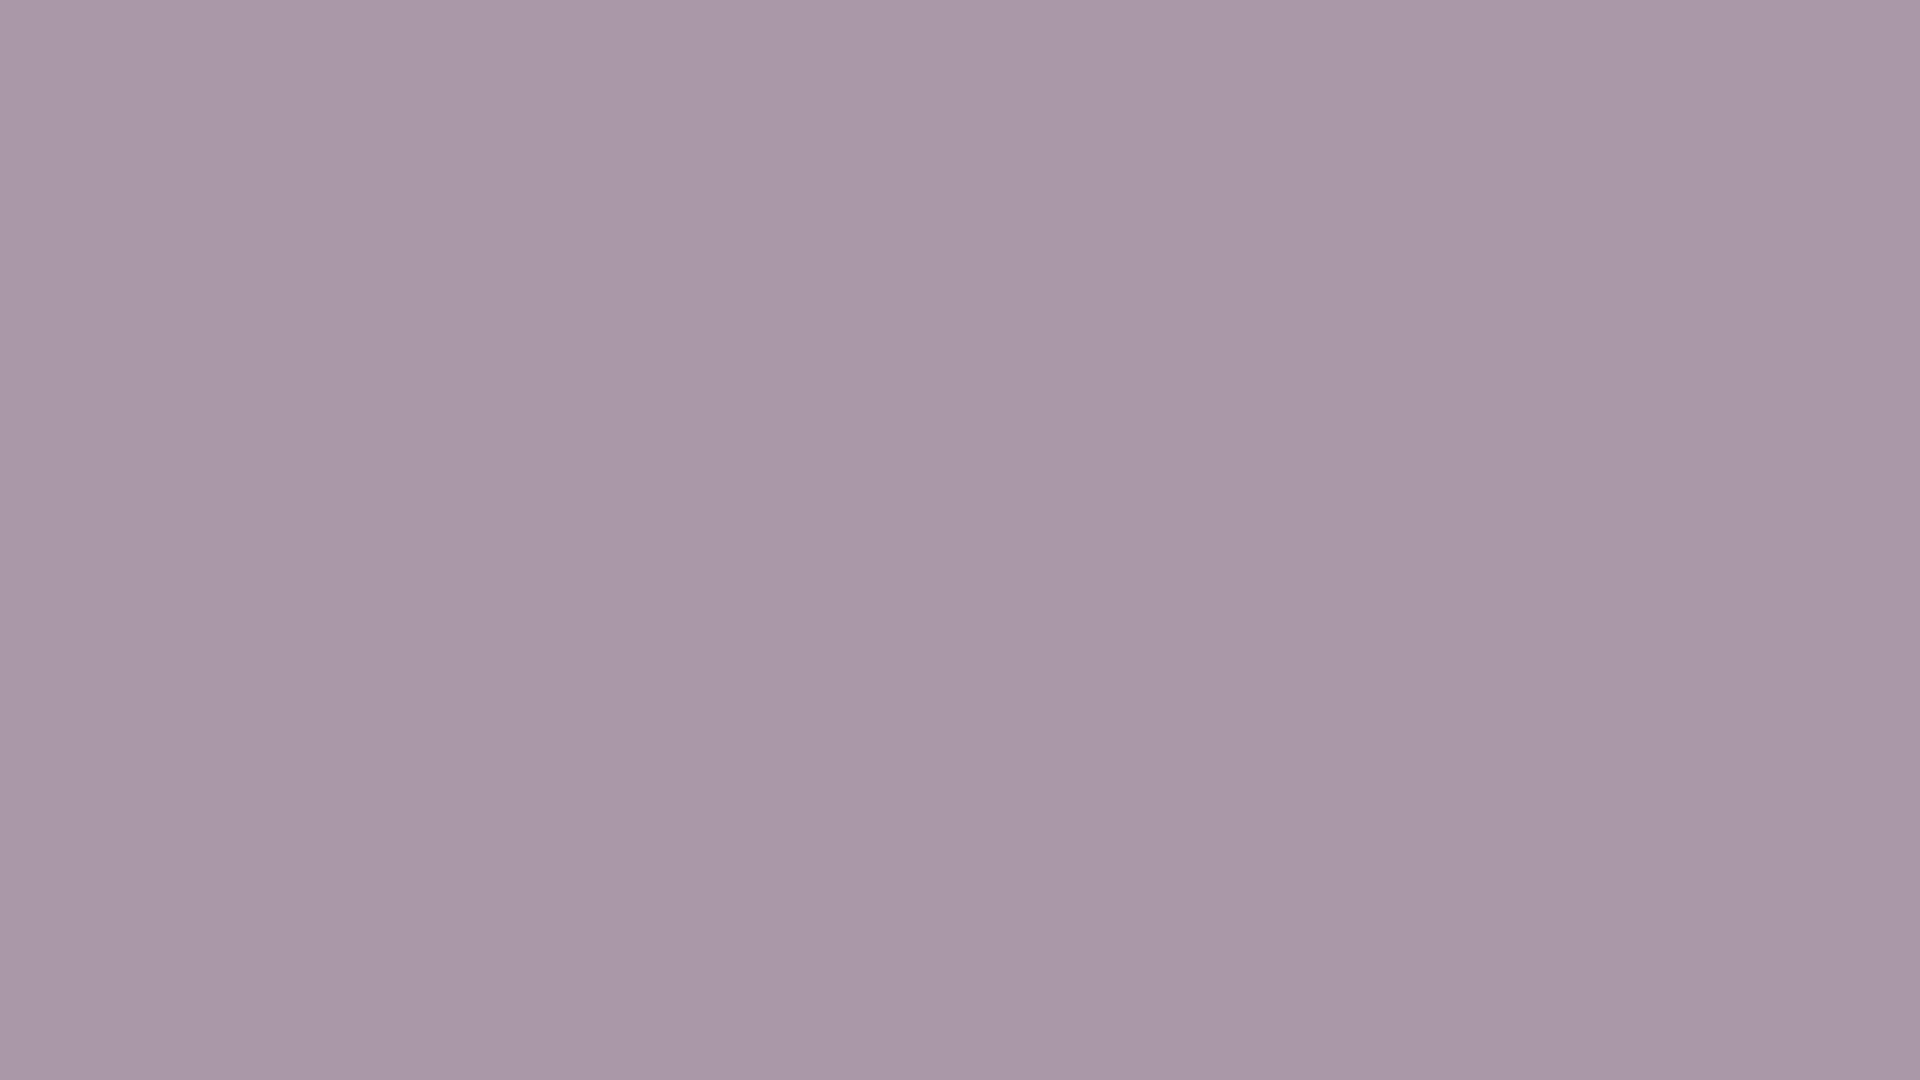 1920x1080 Rose Quartz Solid Color Background